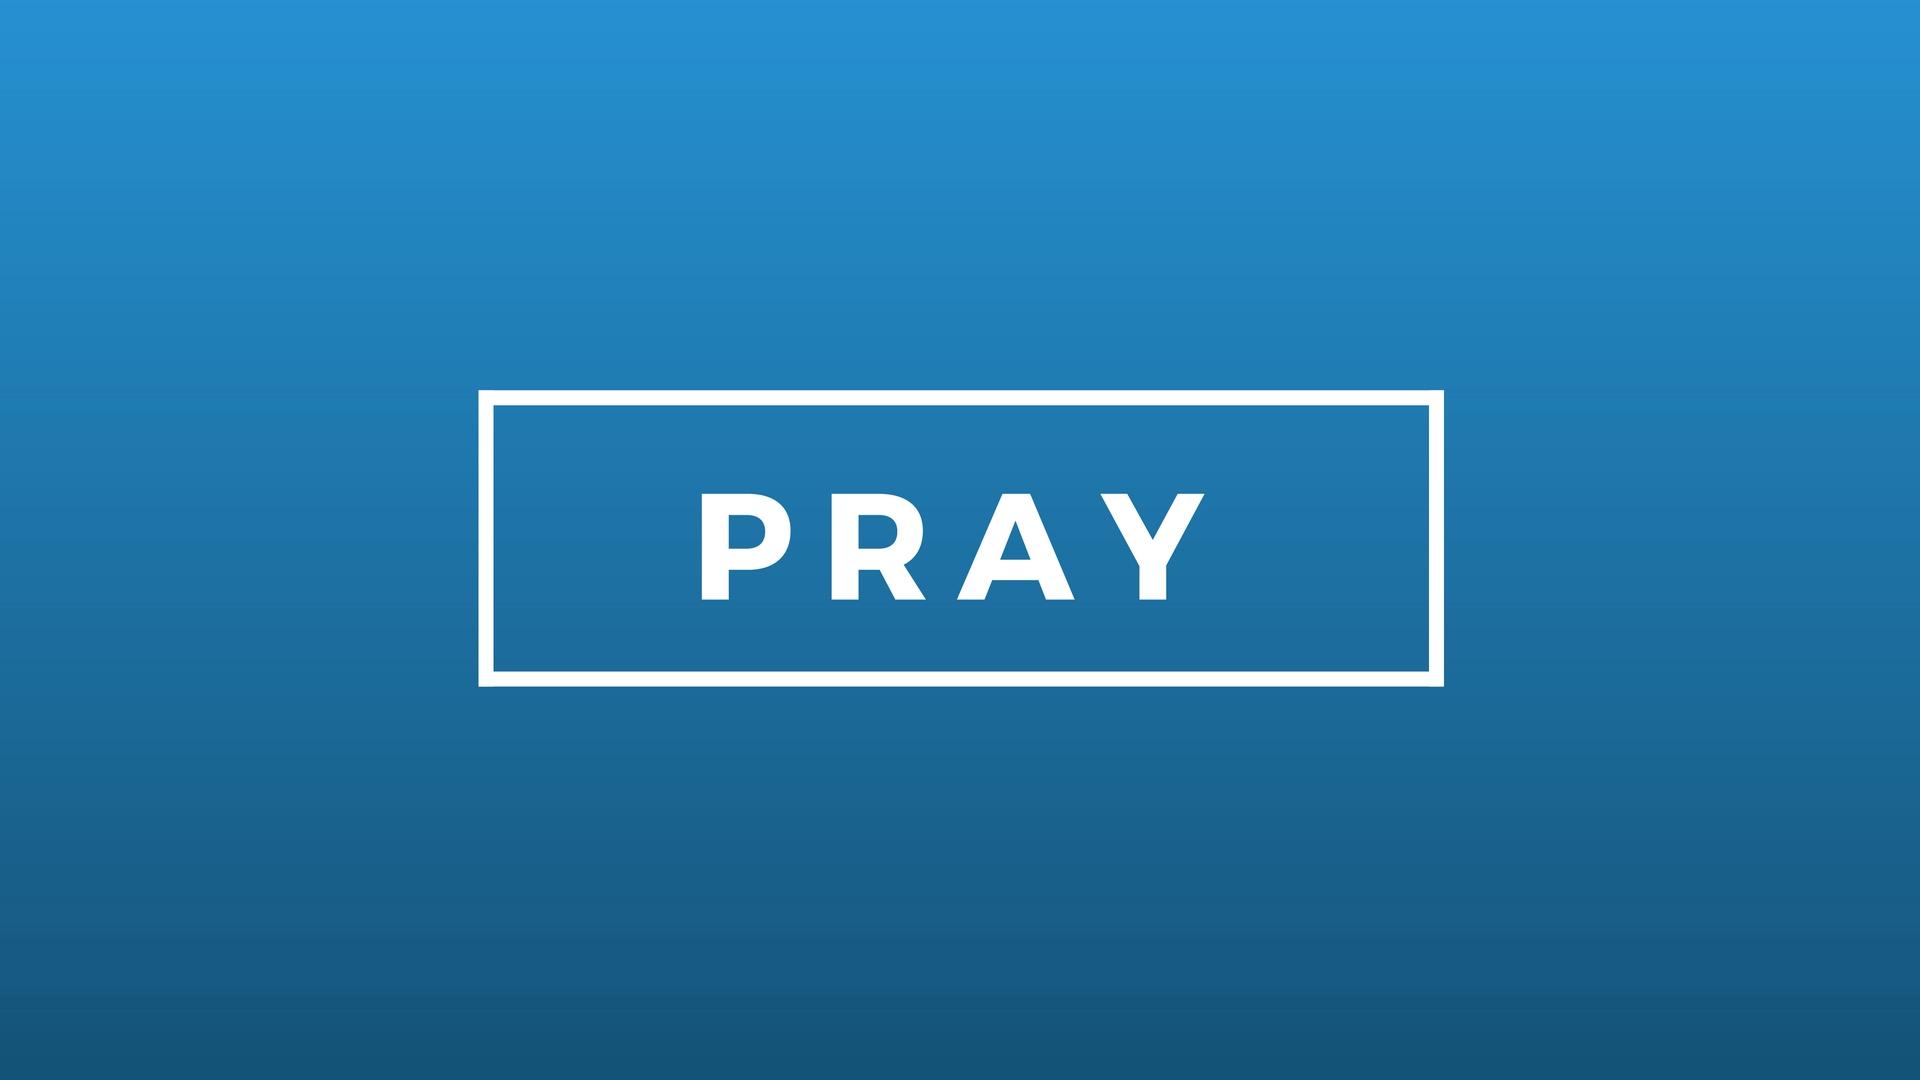 'PRAY' - JANUARY 2017